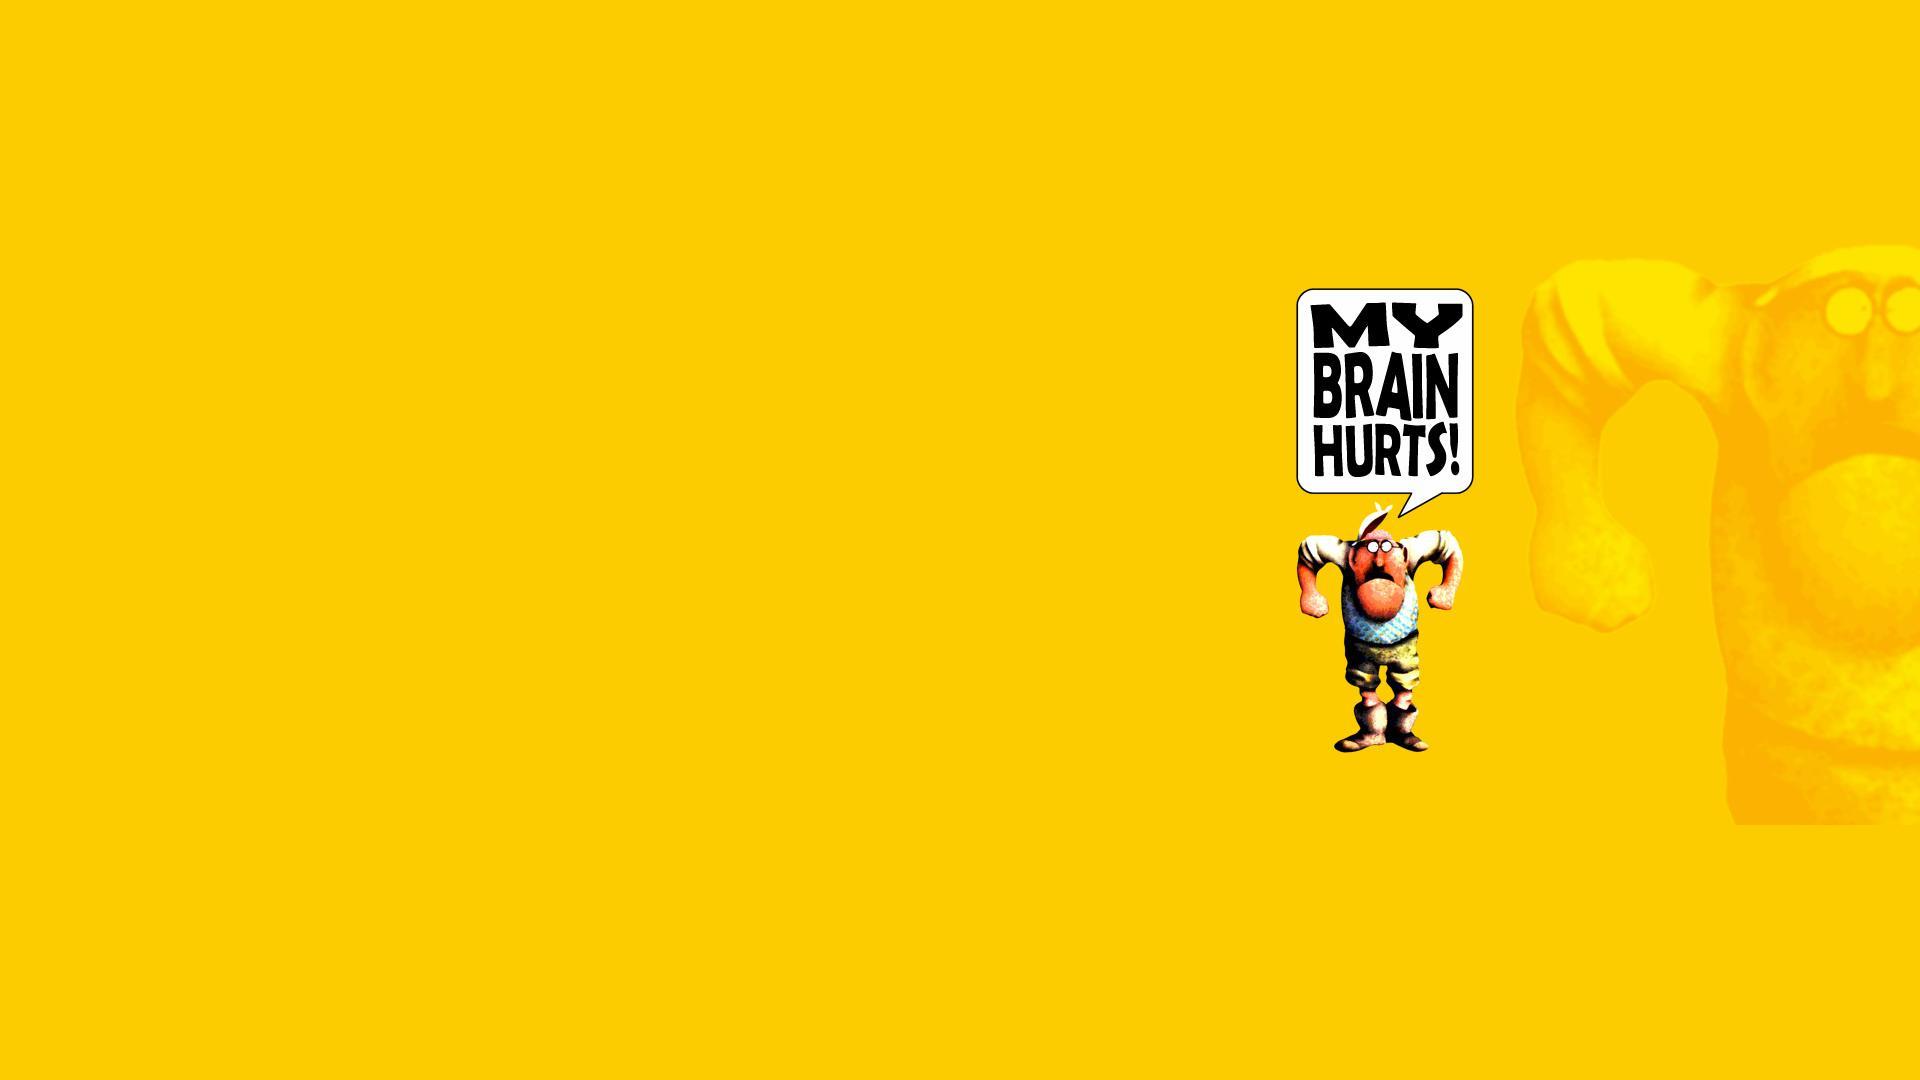 Monty Python Yellow cartoon humor movies text wallpaper 1920x1080 1920x1080